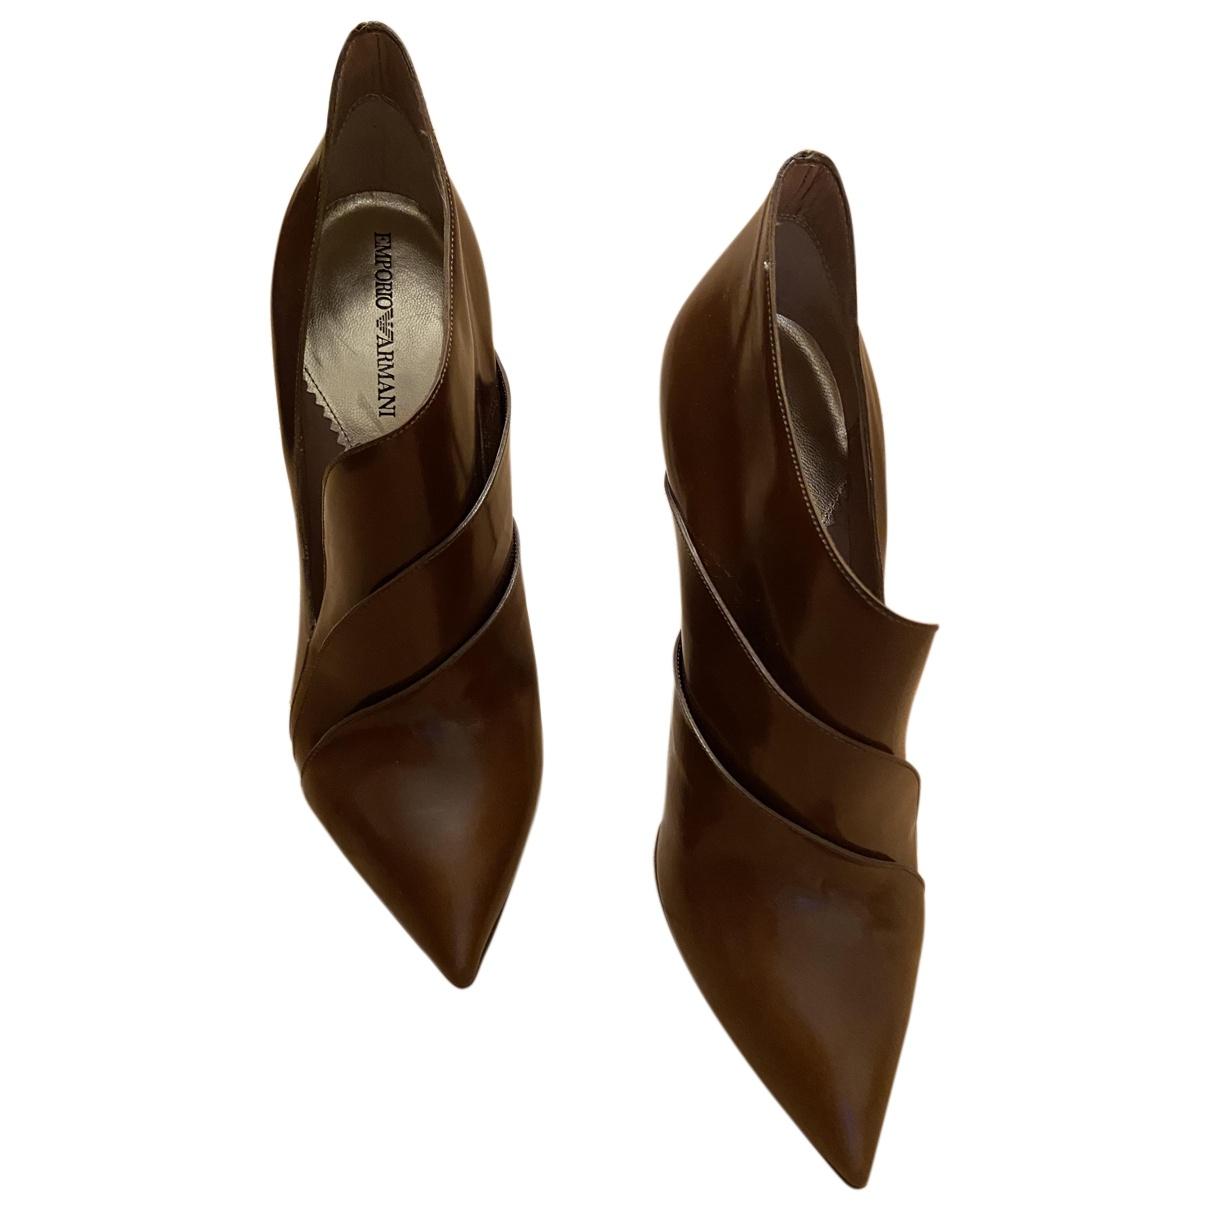 Emporio Armani N Camel Leather Heels for Women 38.5 EU